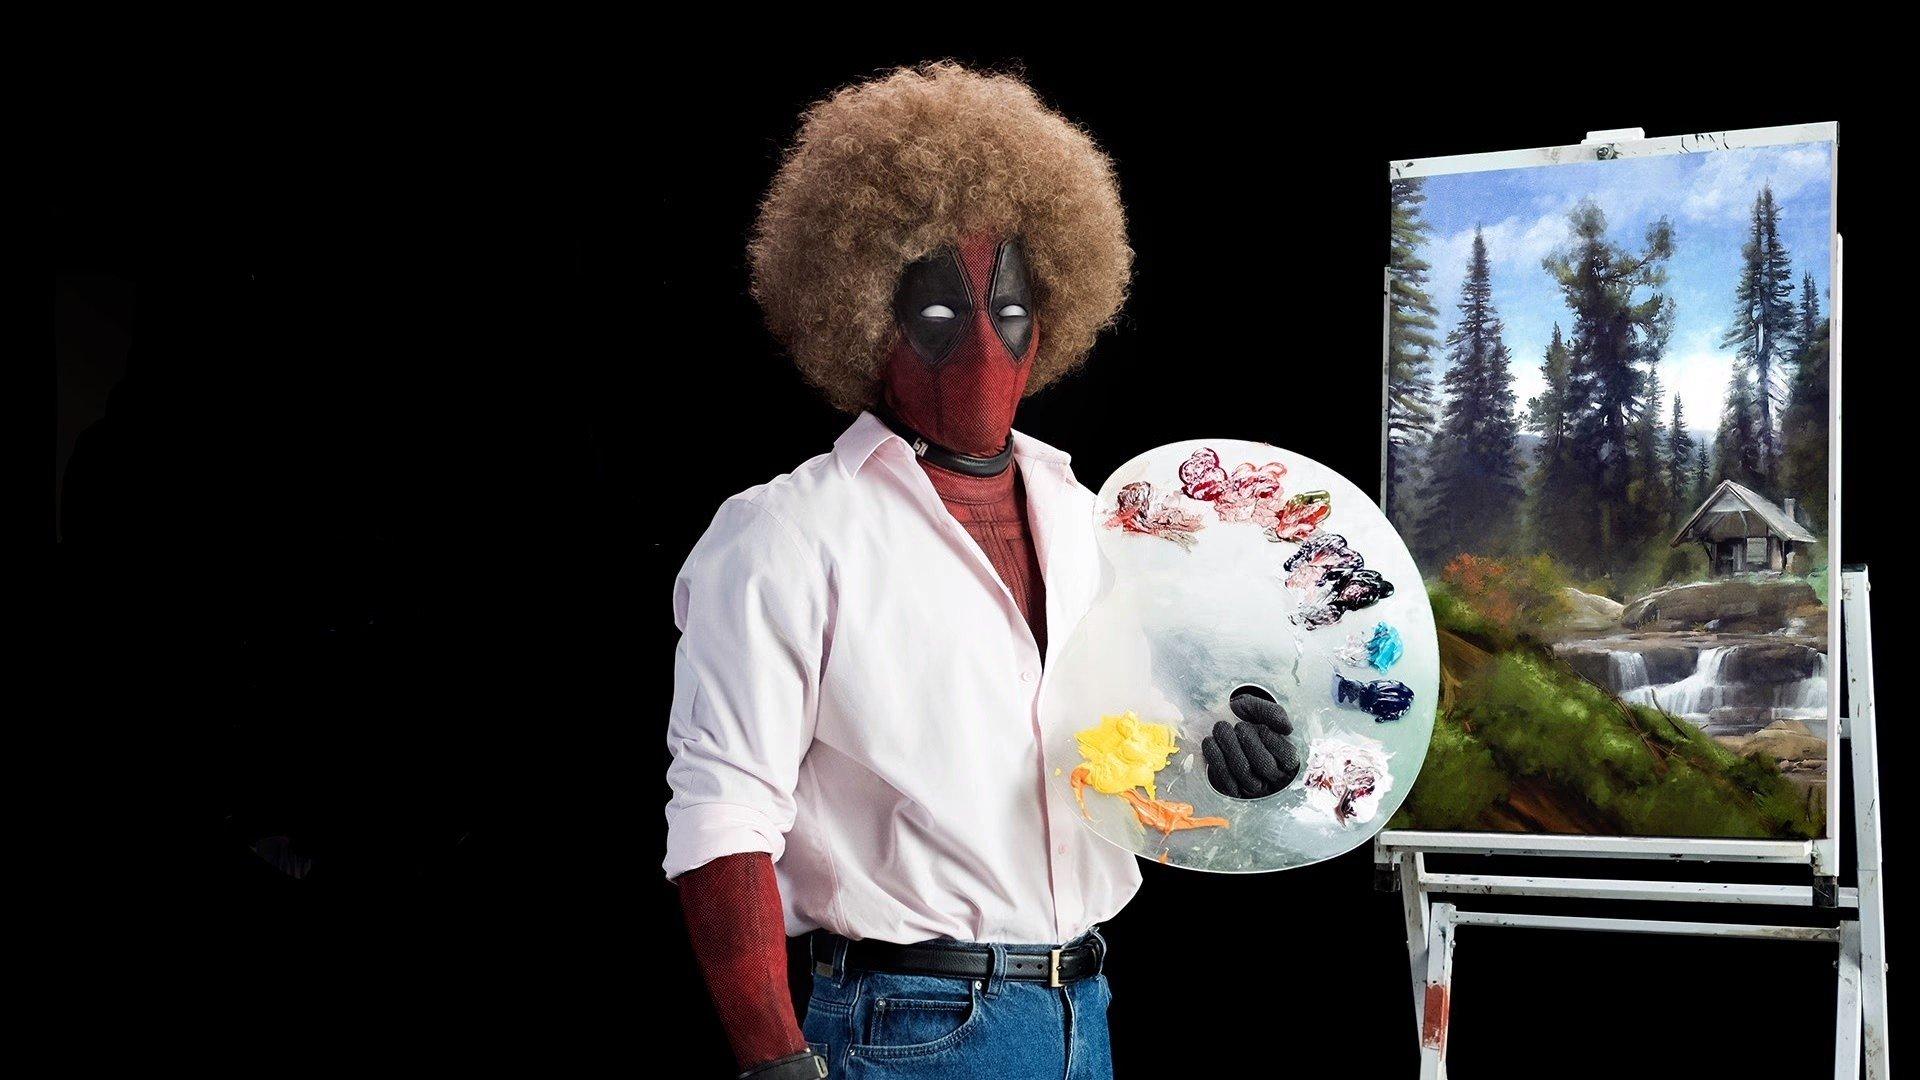 Movie - Deadpool 2  Bob Ross Deadpool Painting Ryan Reynolds Wallpaper